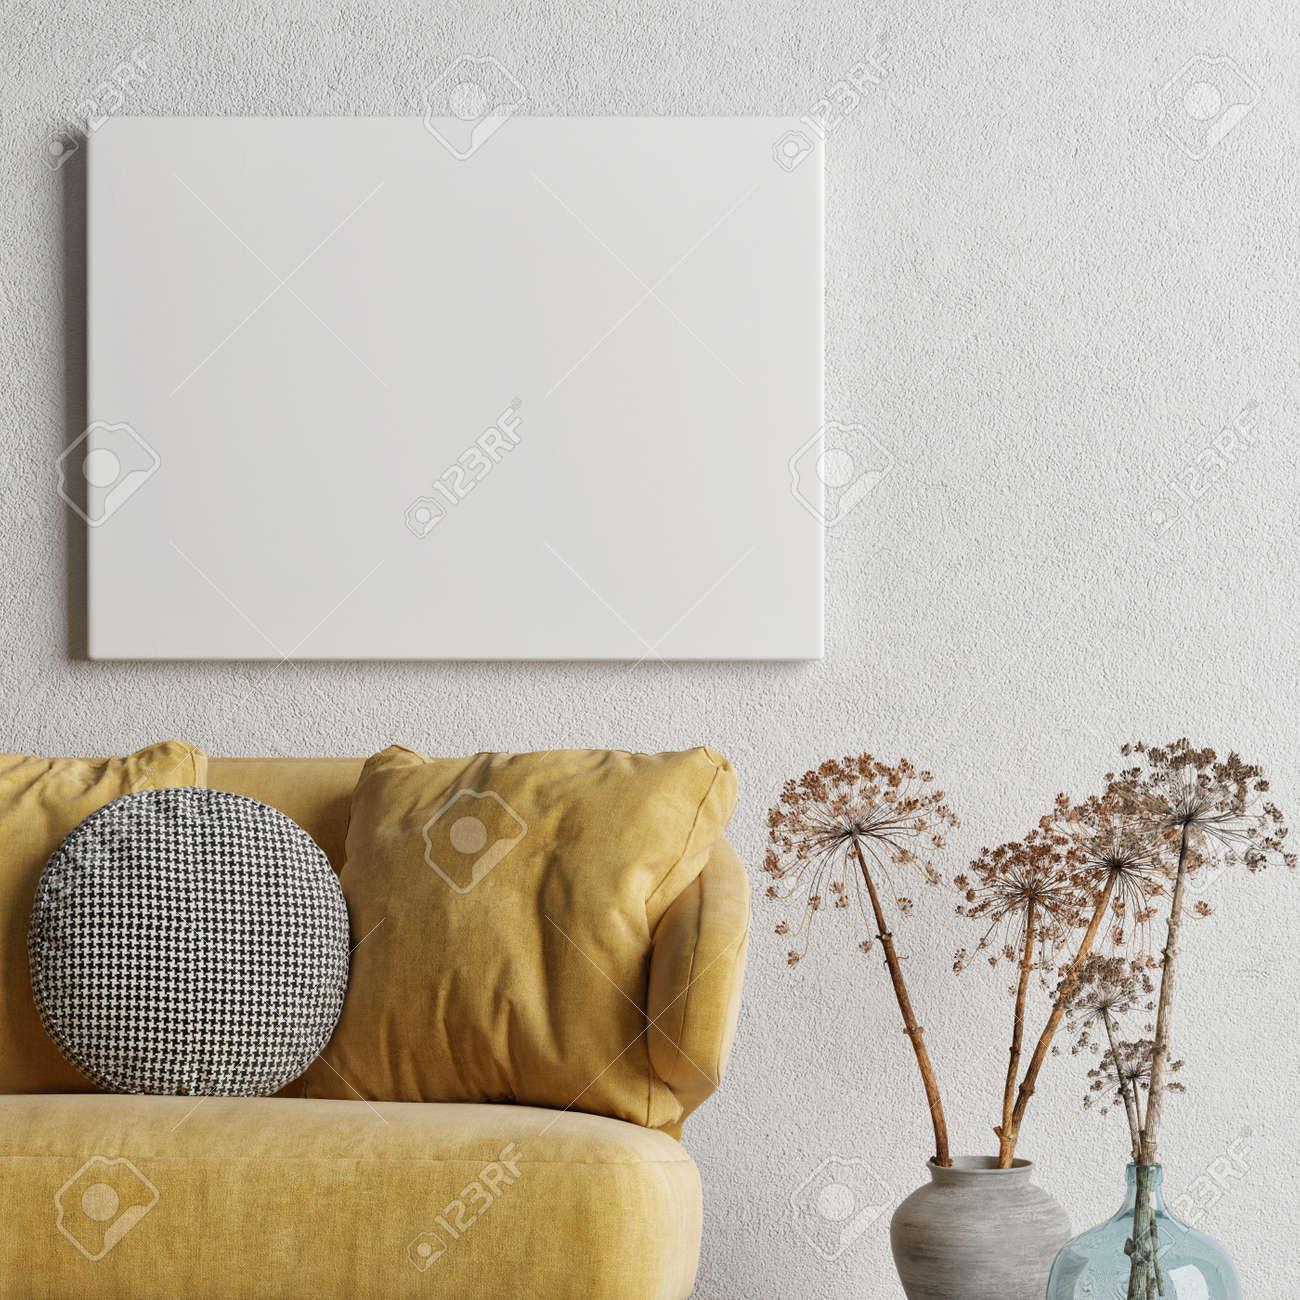 Mockup poster, Livingroom interior design with comfortable sofa, 3d illustration - 159149301